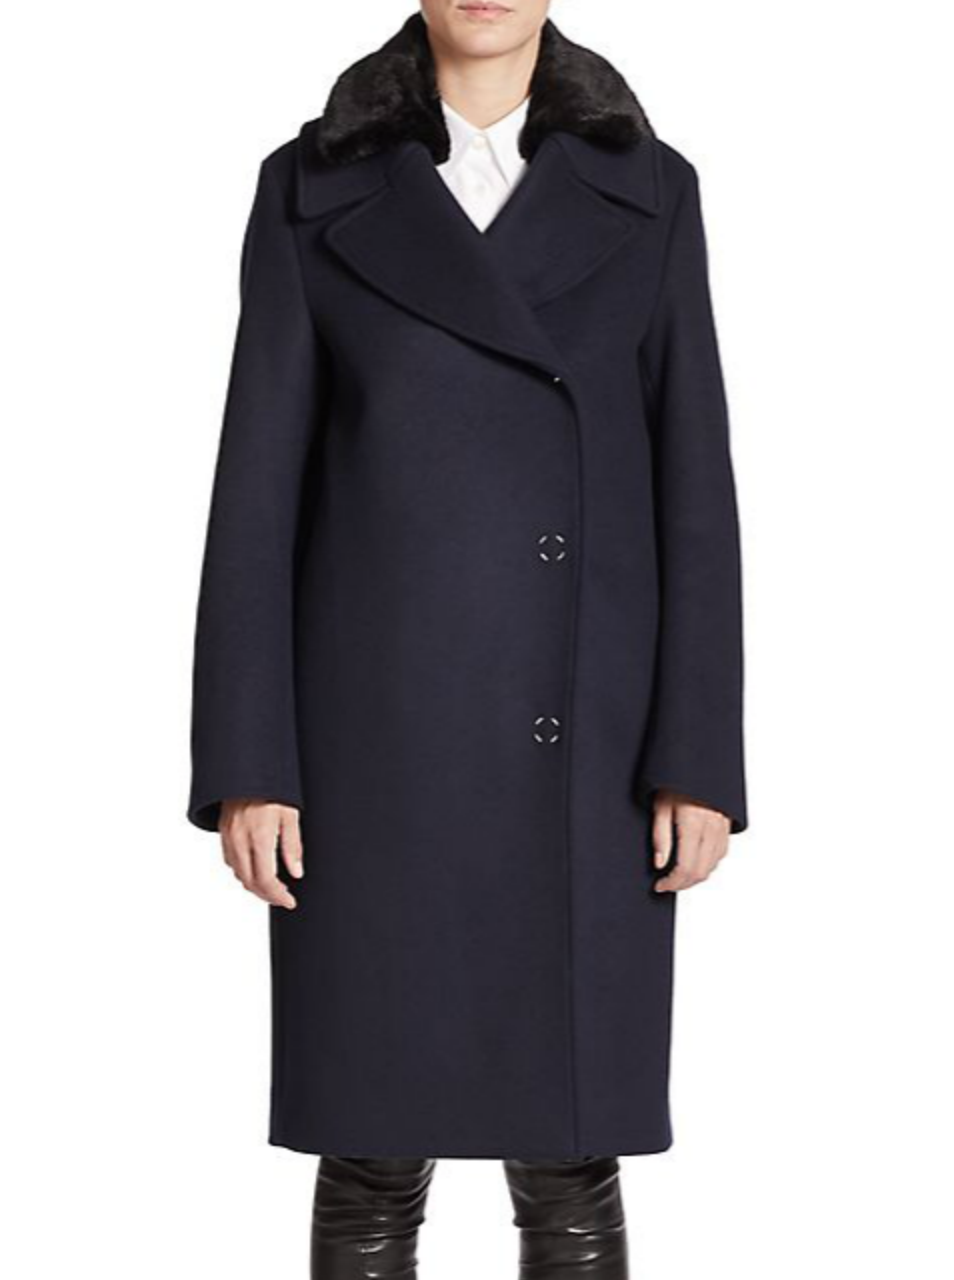 Acne Wool Coat